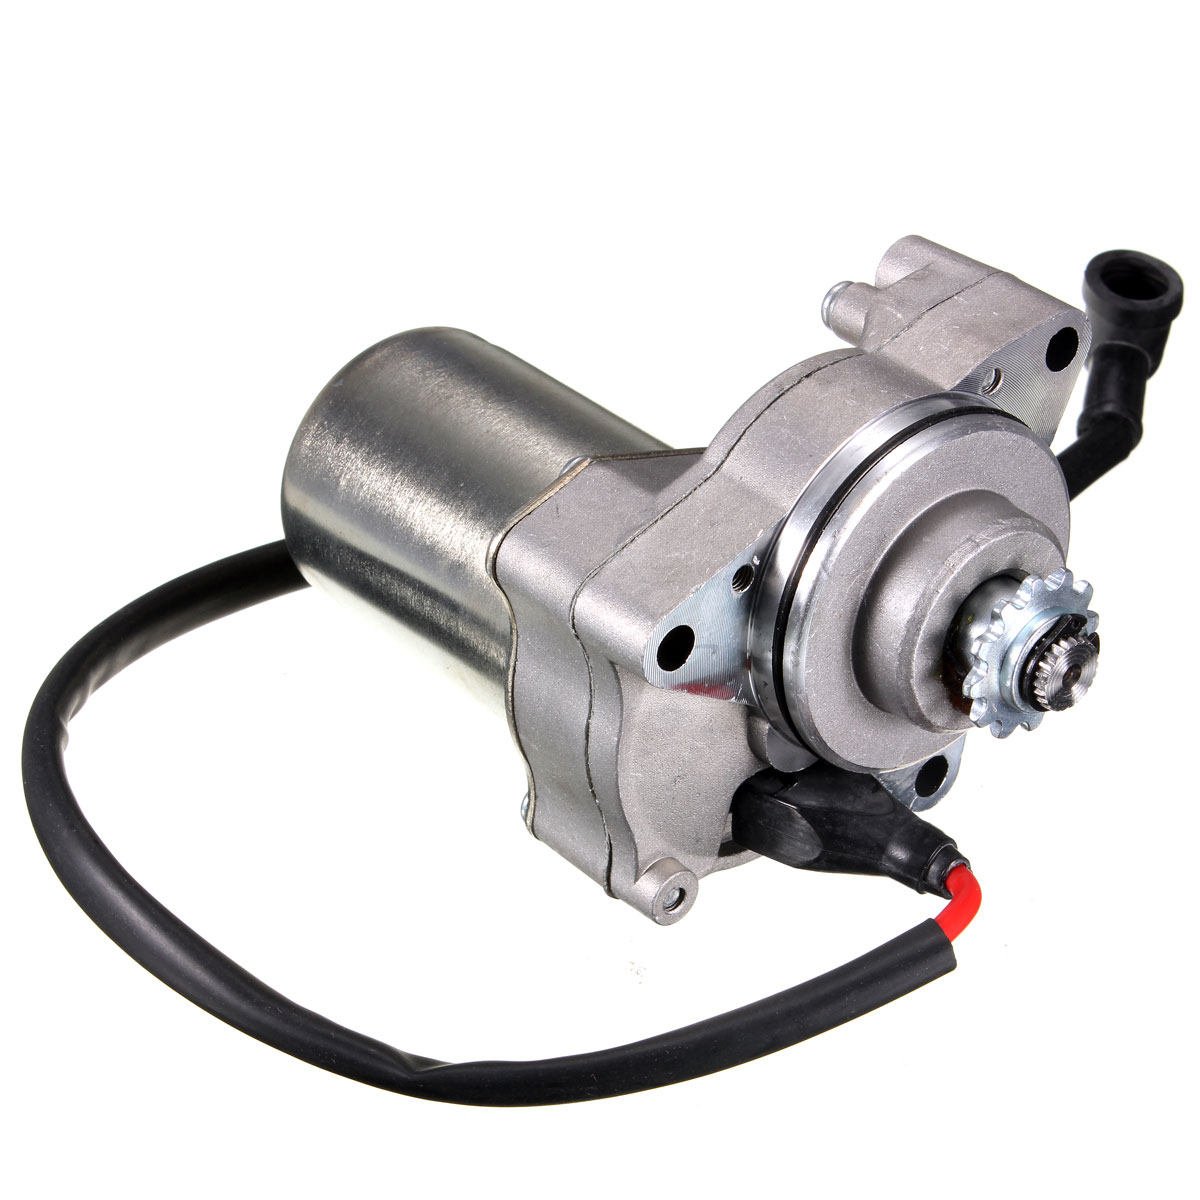 hight resolution of 12v 48v 3 bolt motorbike atv electric starter motor for 50cc 90cc 110cc 4 stroke engine quad atv for honda kawasaki